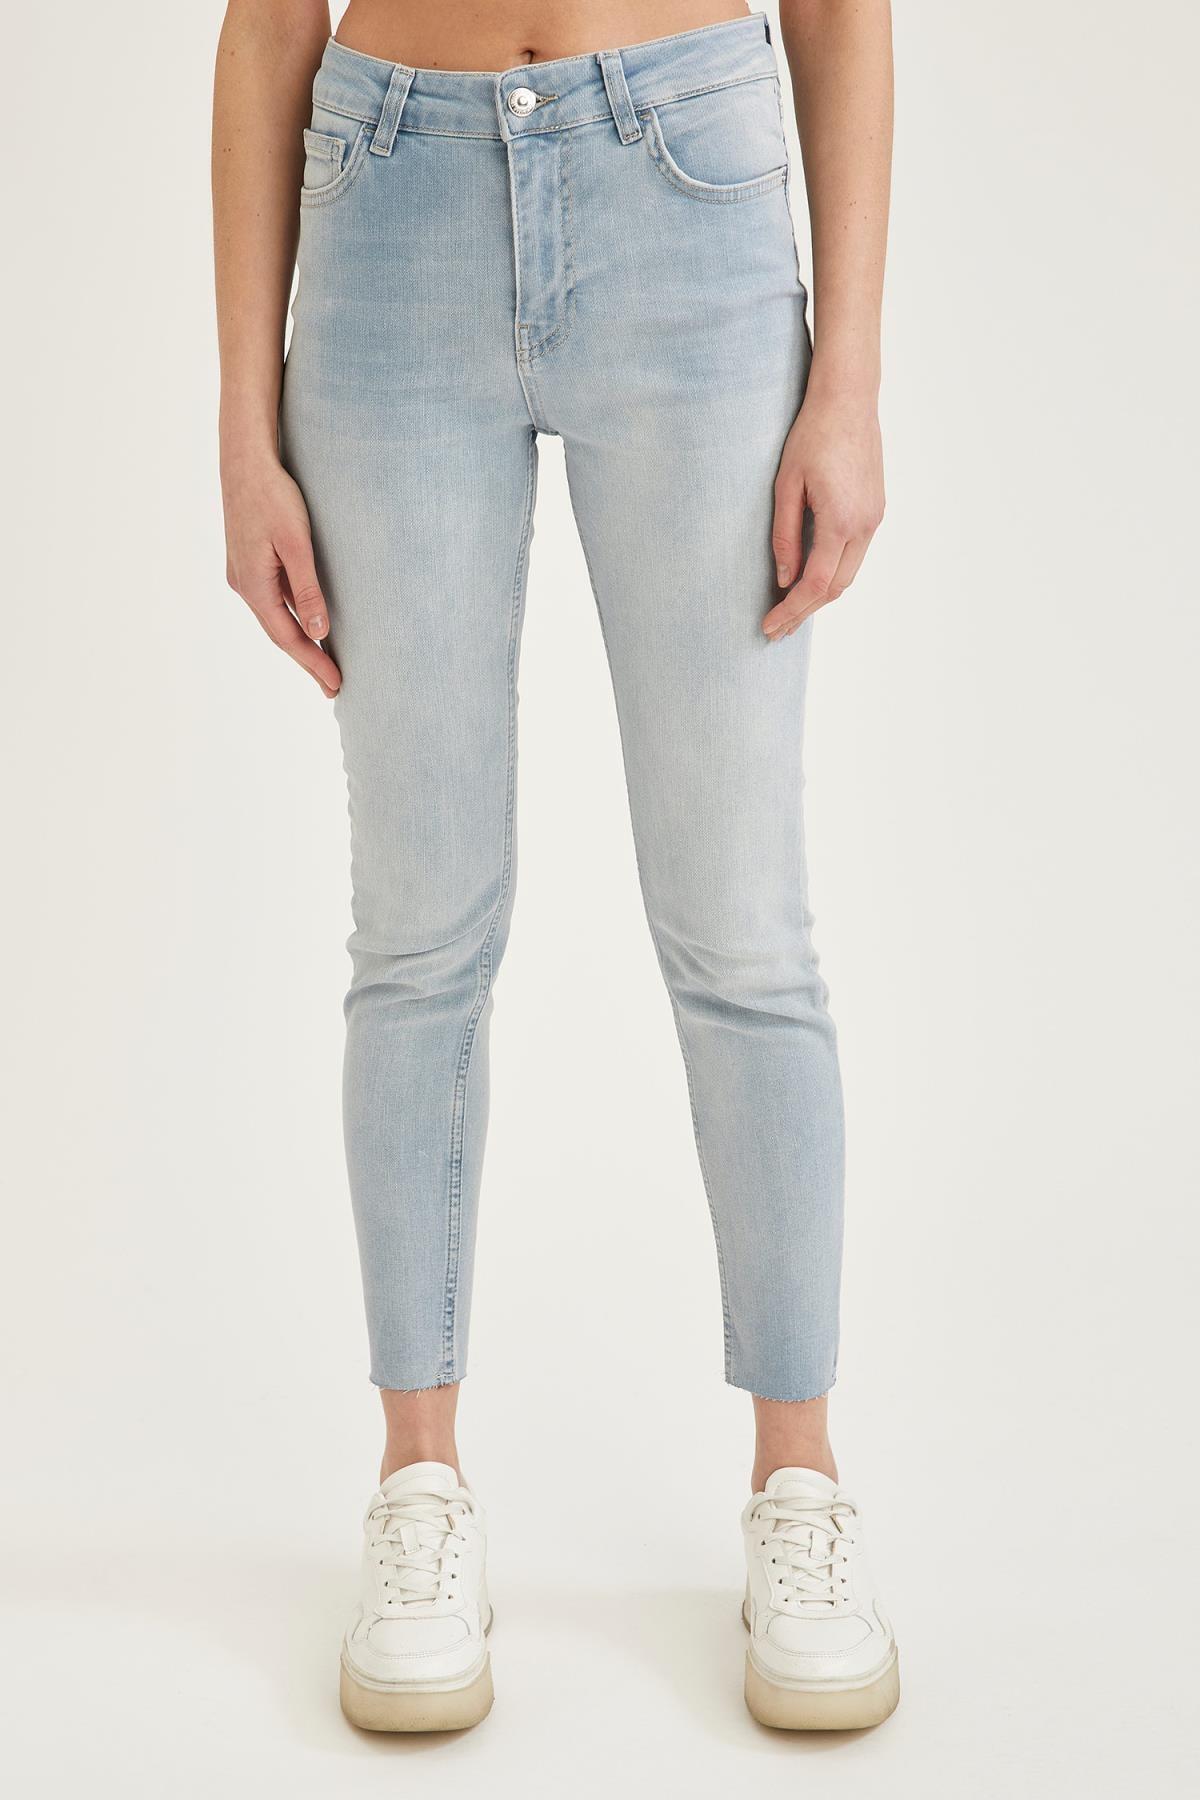 Kadın Mavi Slim Fit Jean Pantolon